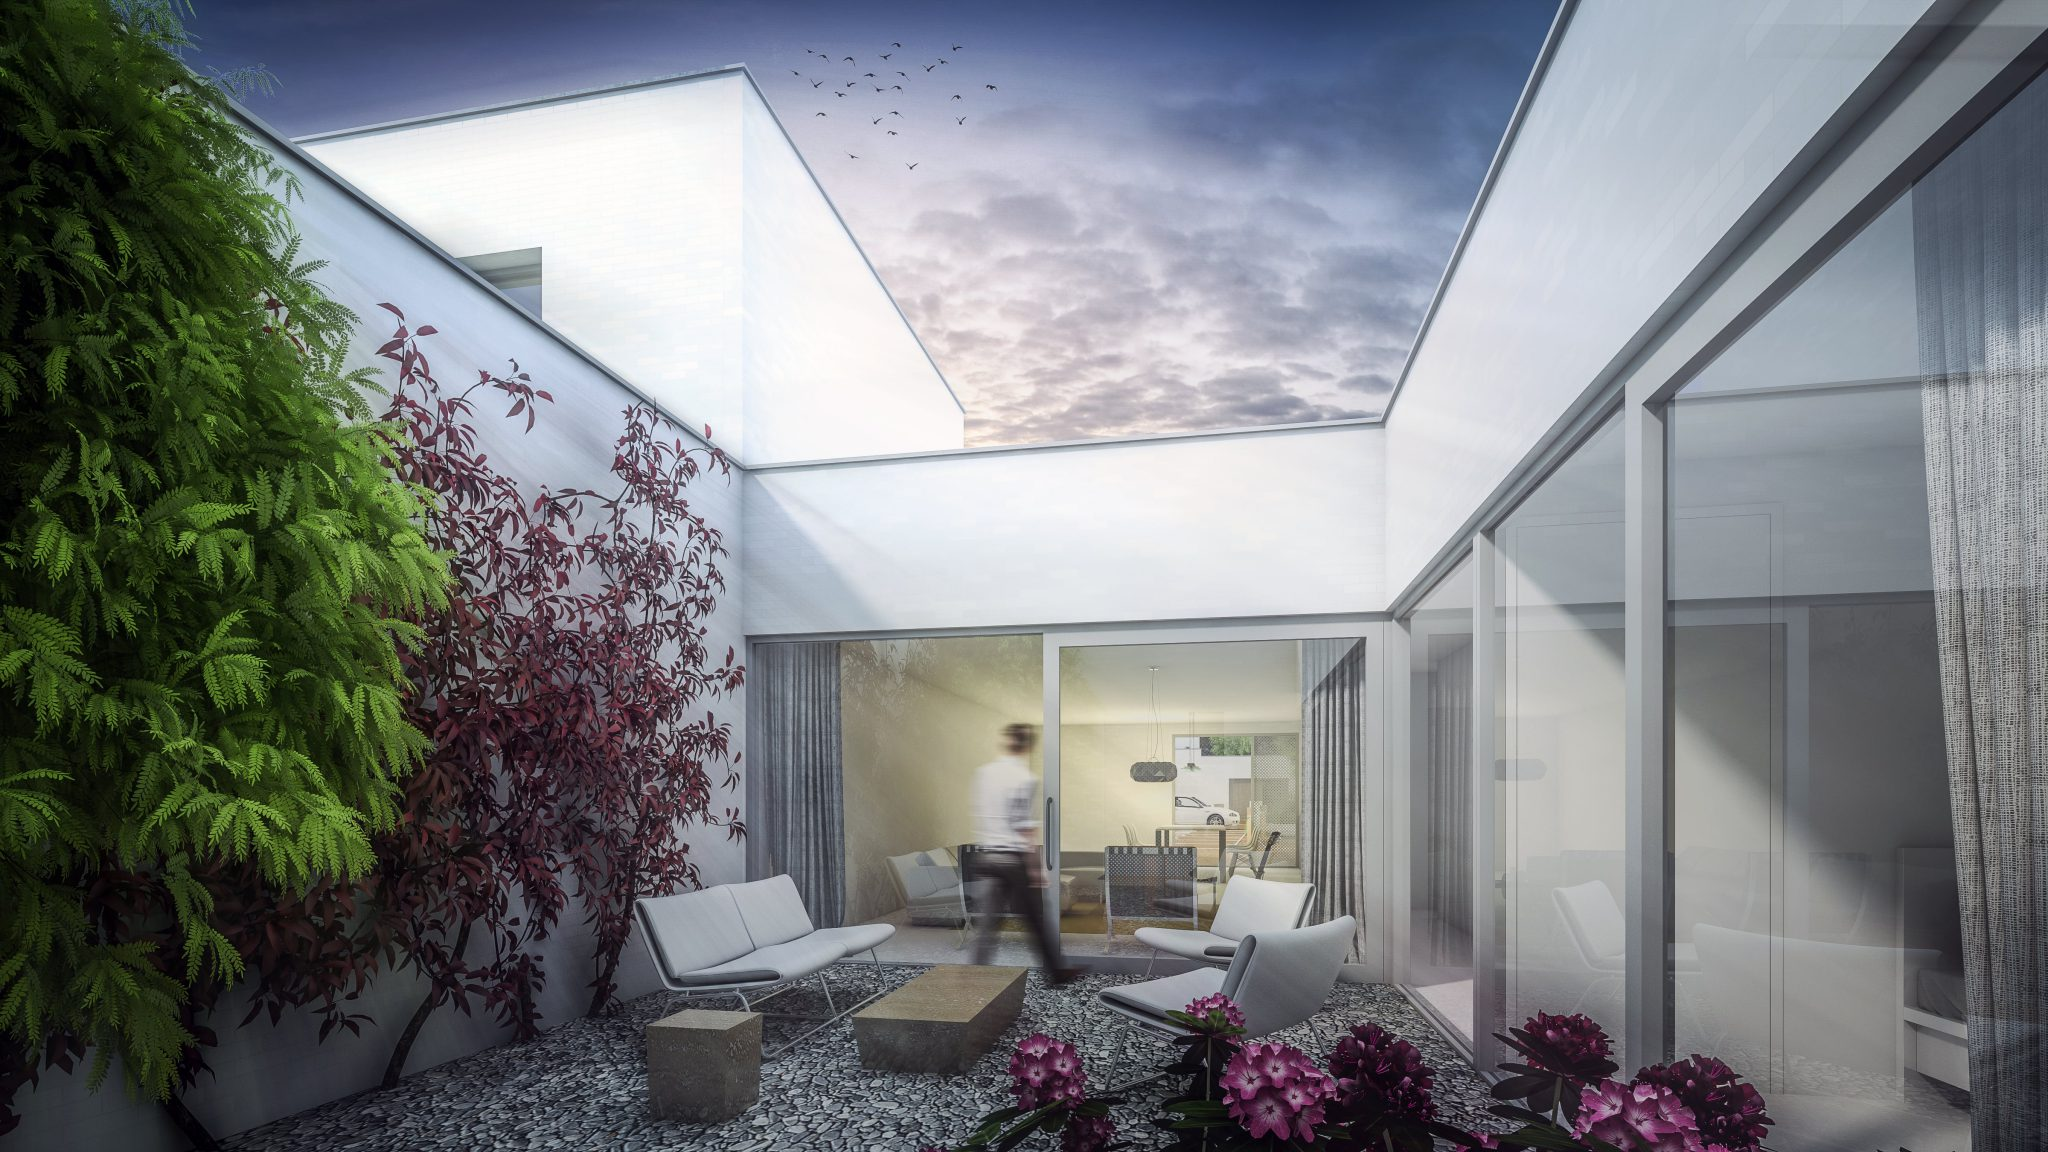 Heikantsestraat Prinsenbeek JMW architecten